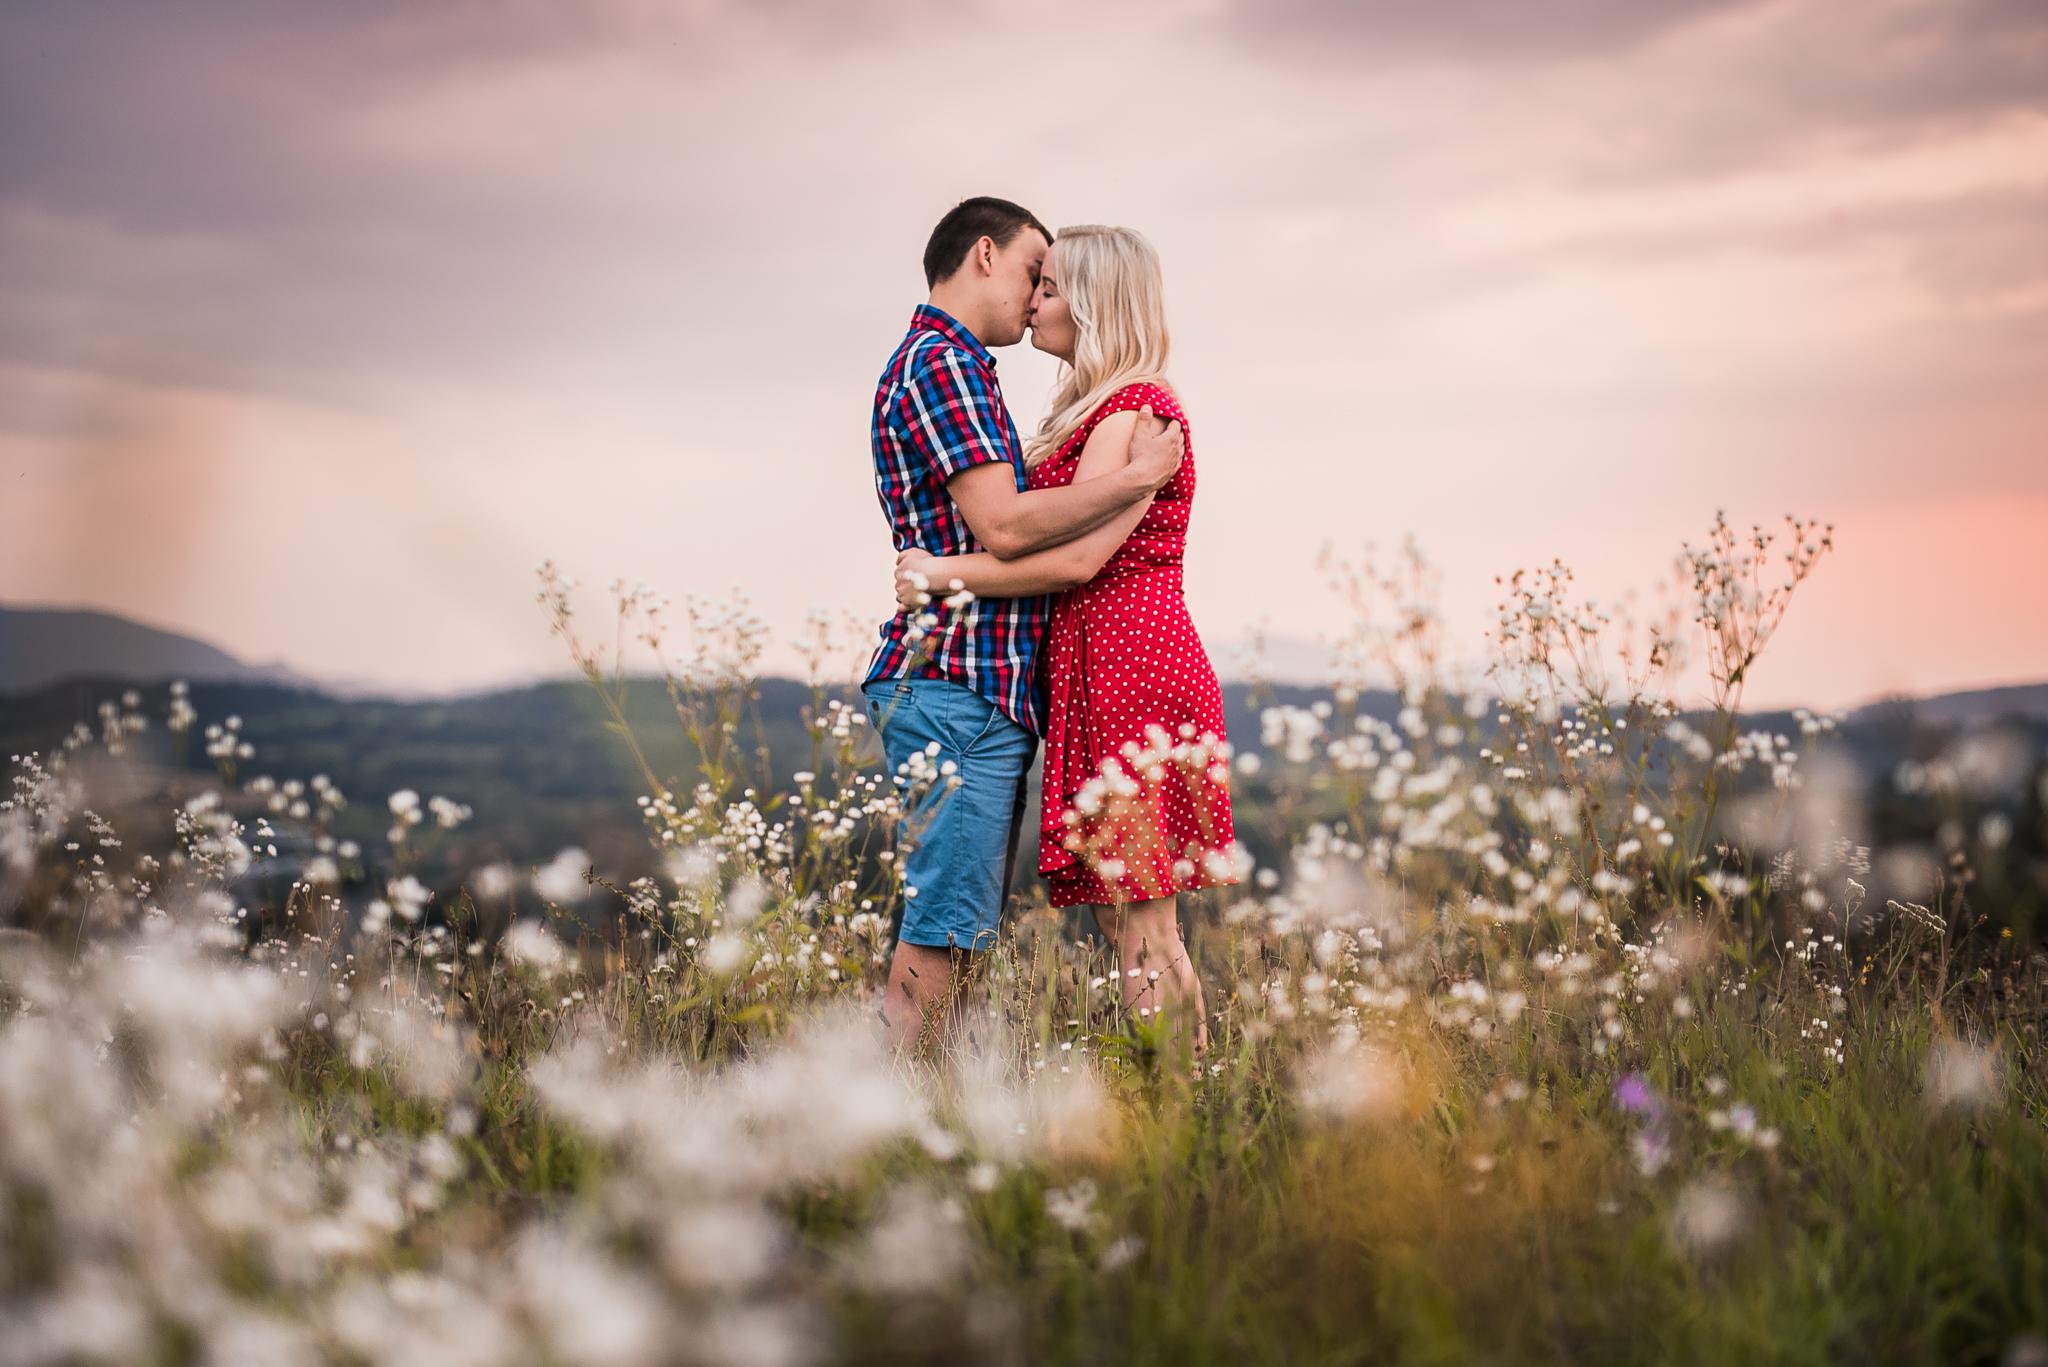 pár, láska, bozk, lúka, kvety, Bratislava